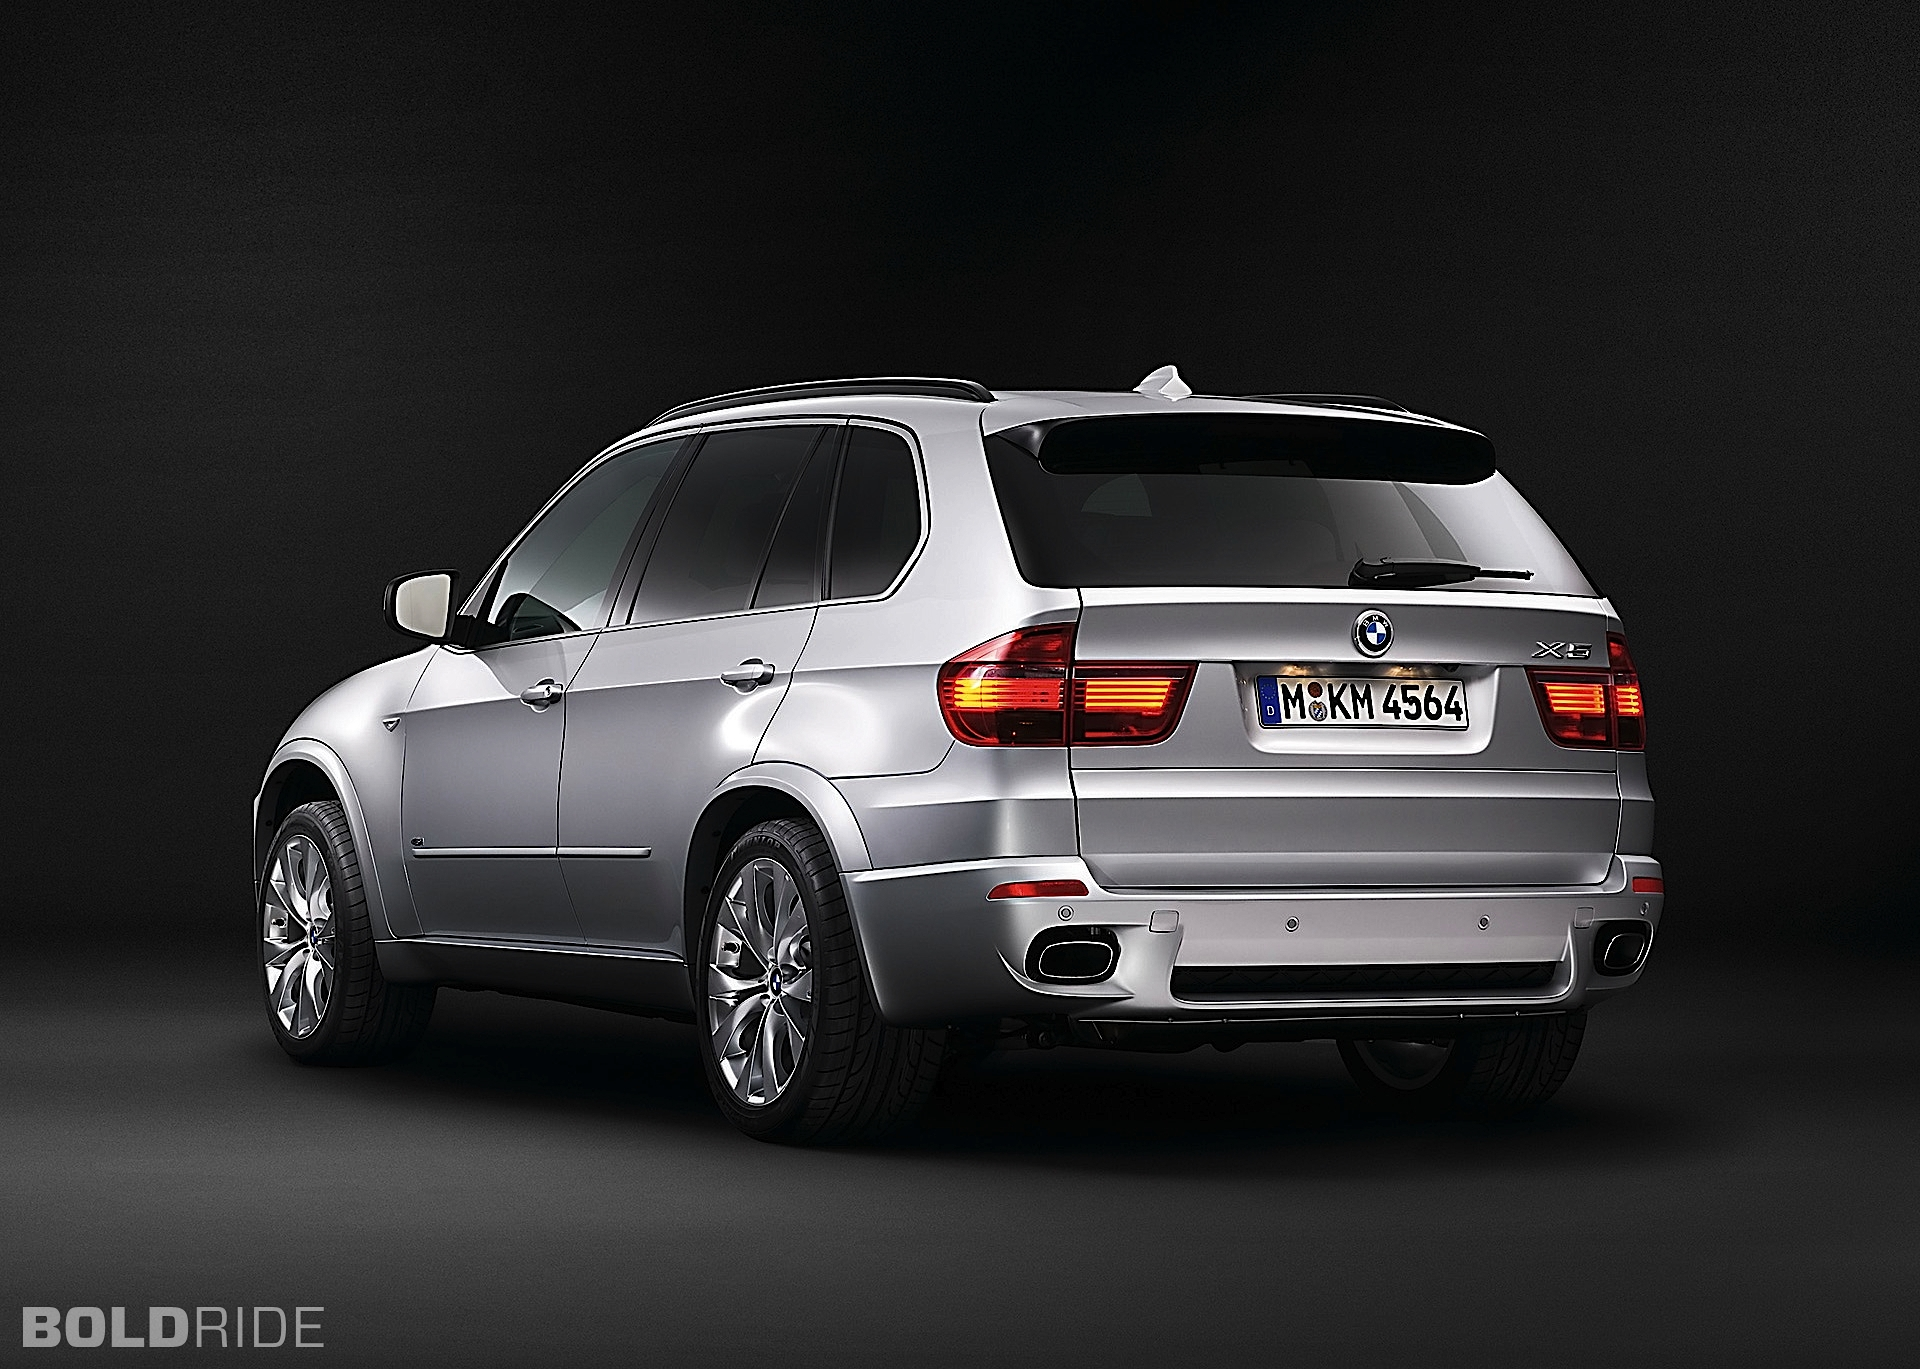 2011 bmw x5 m suv base 4dr all wheel drive sports activity vehicle